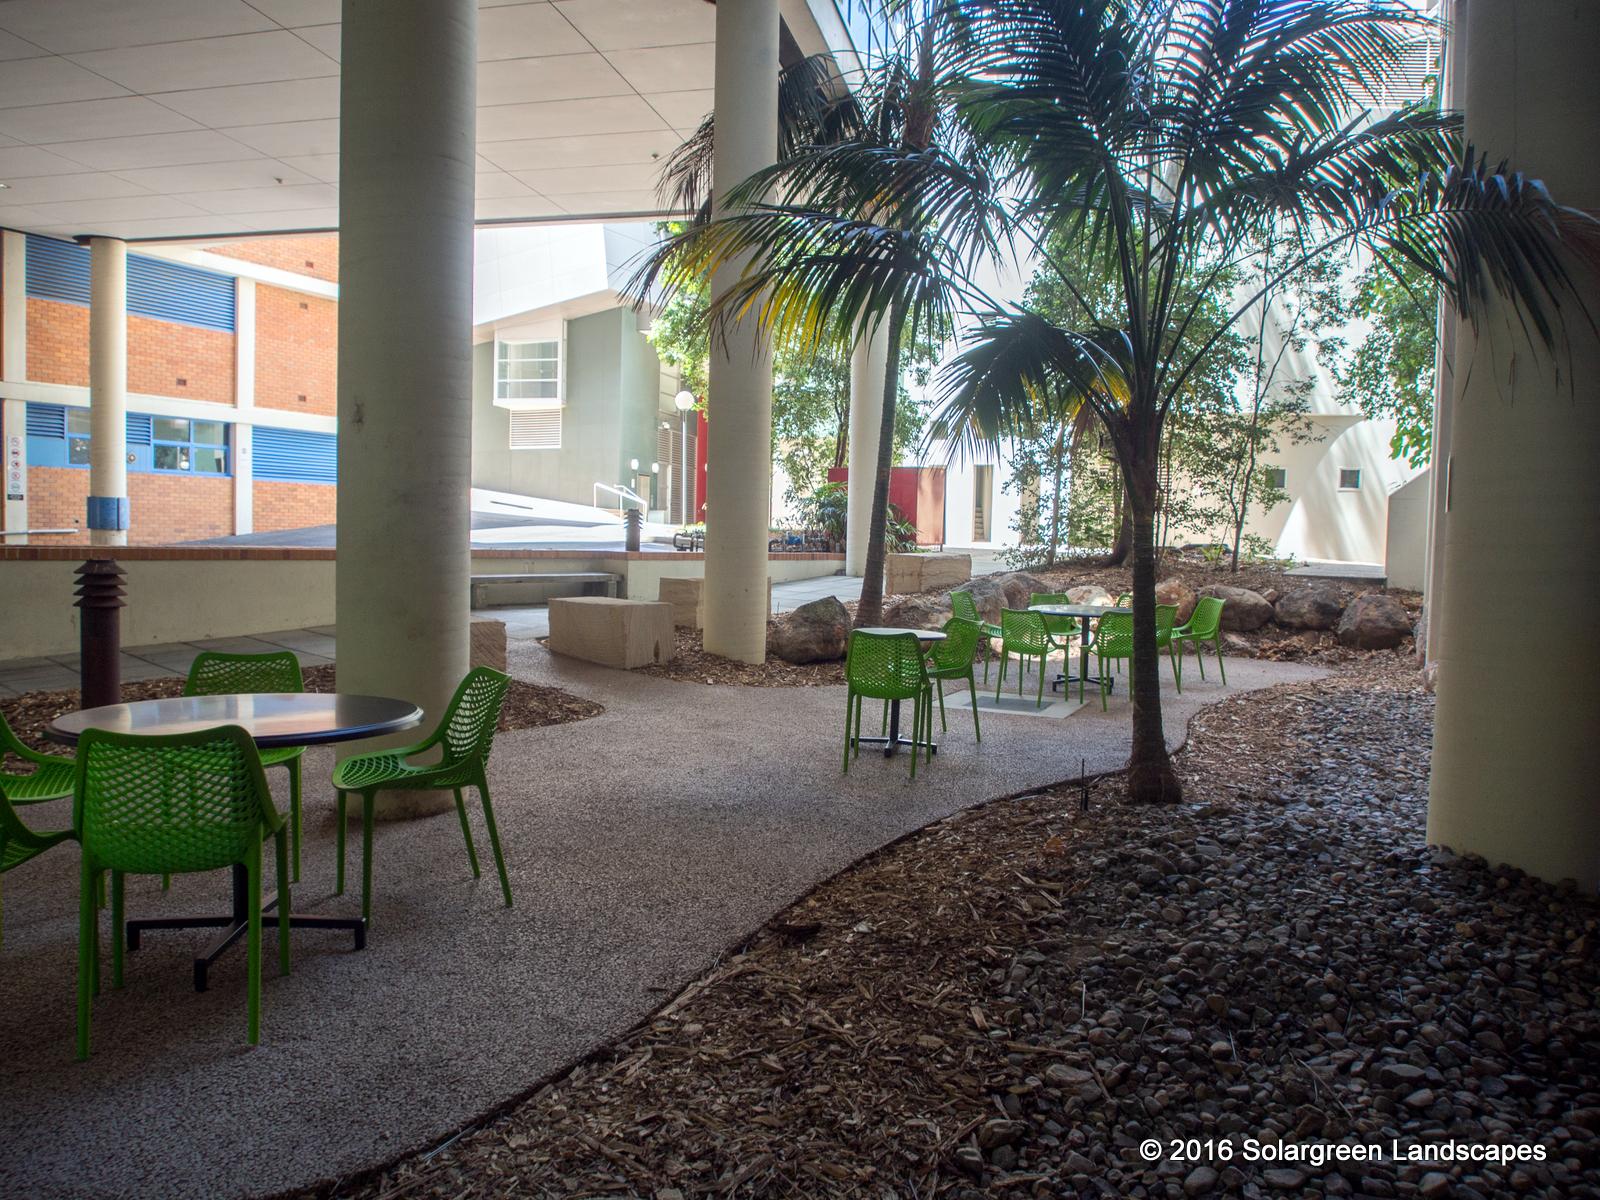 Beautiful UQ Therapies Courtyard Constrcuted